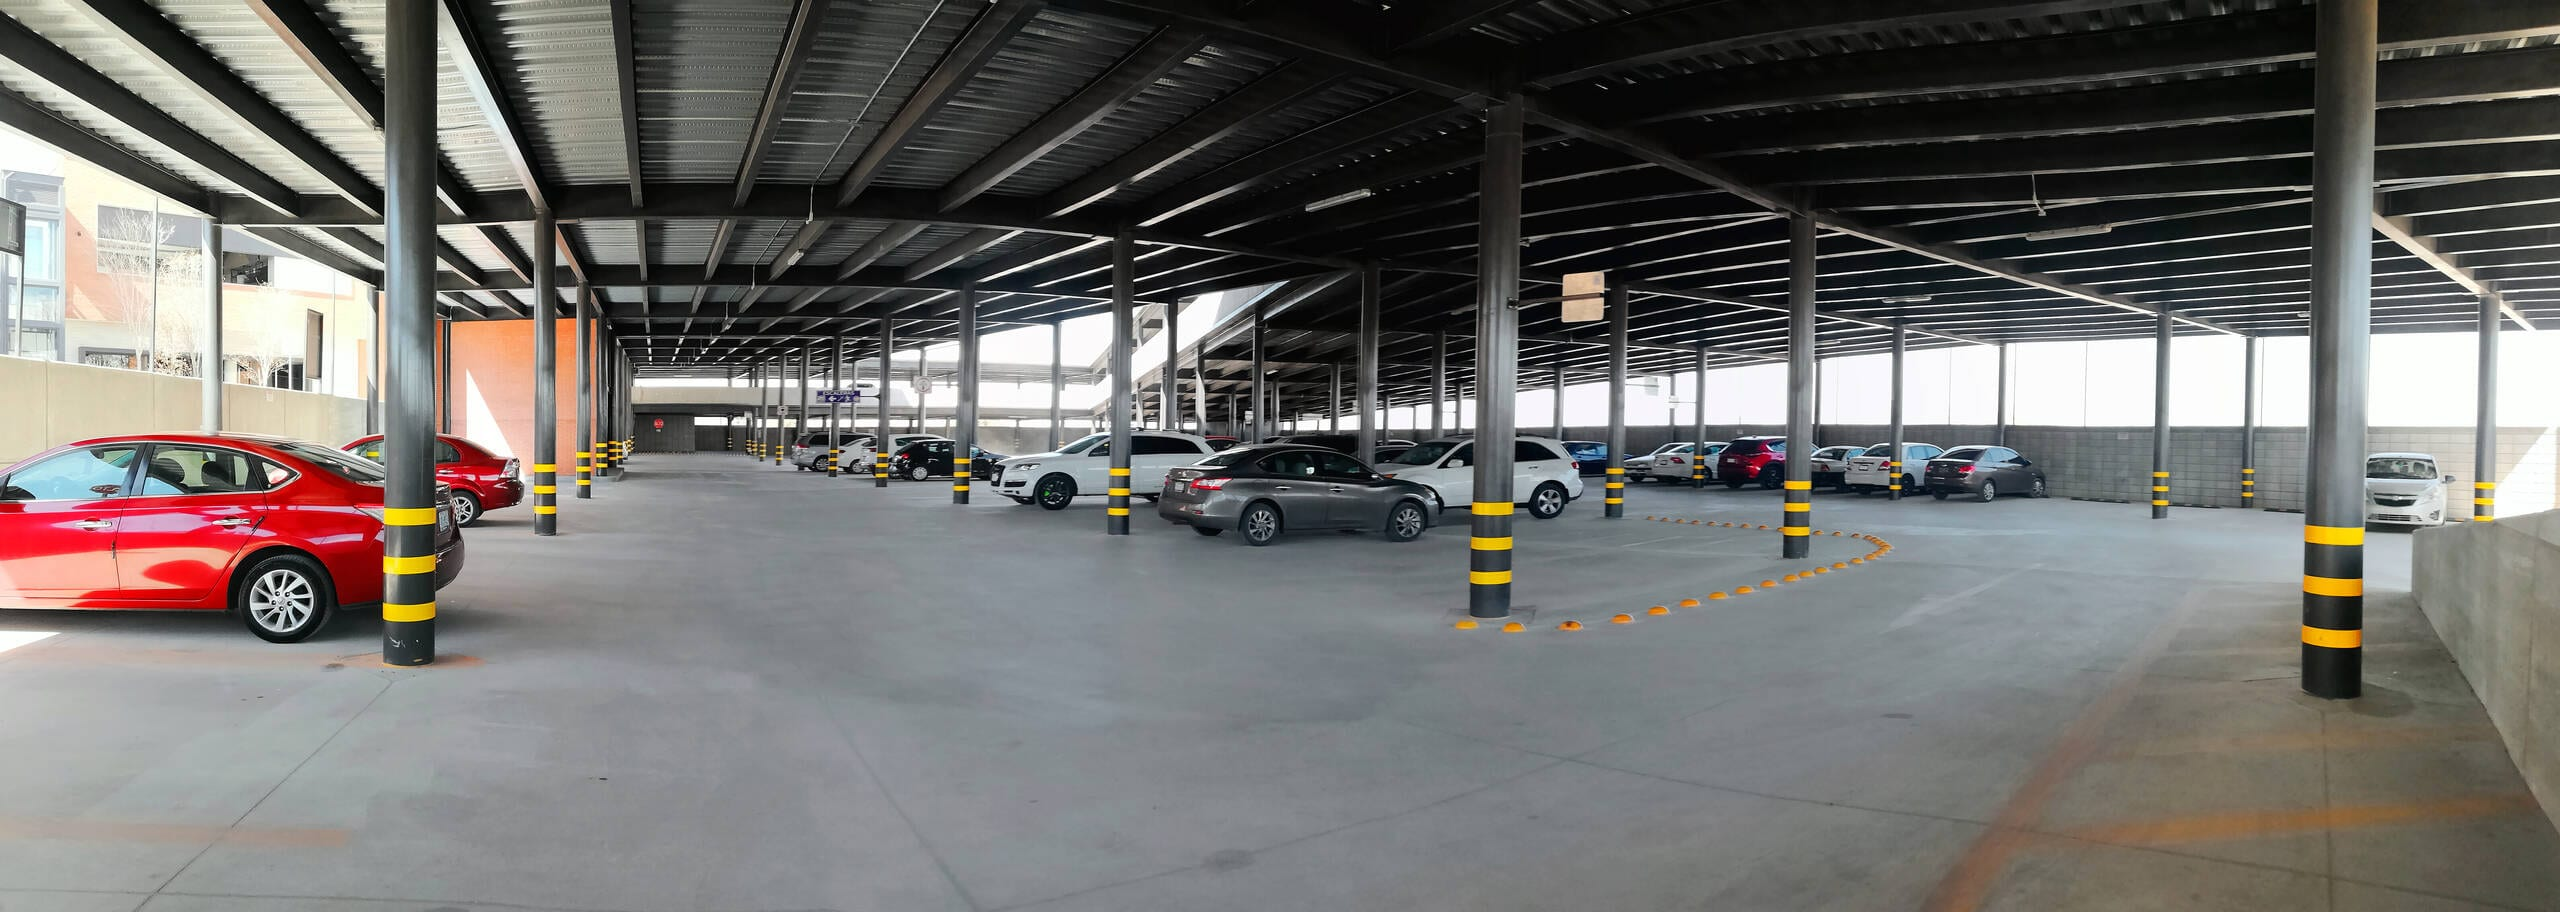 Estacionamiento Paseo Milex 2